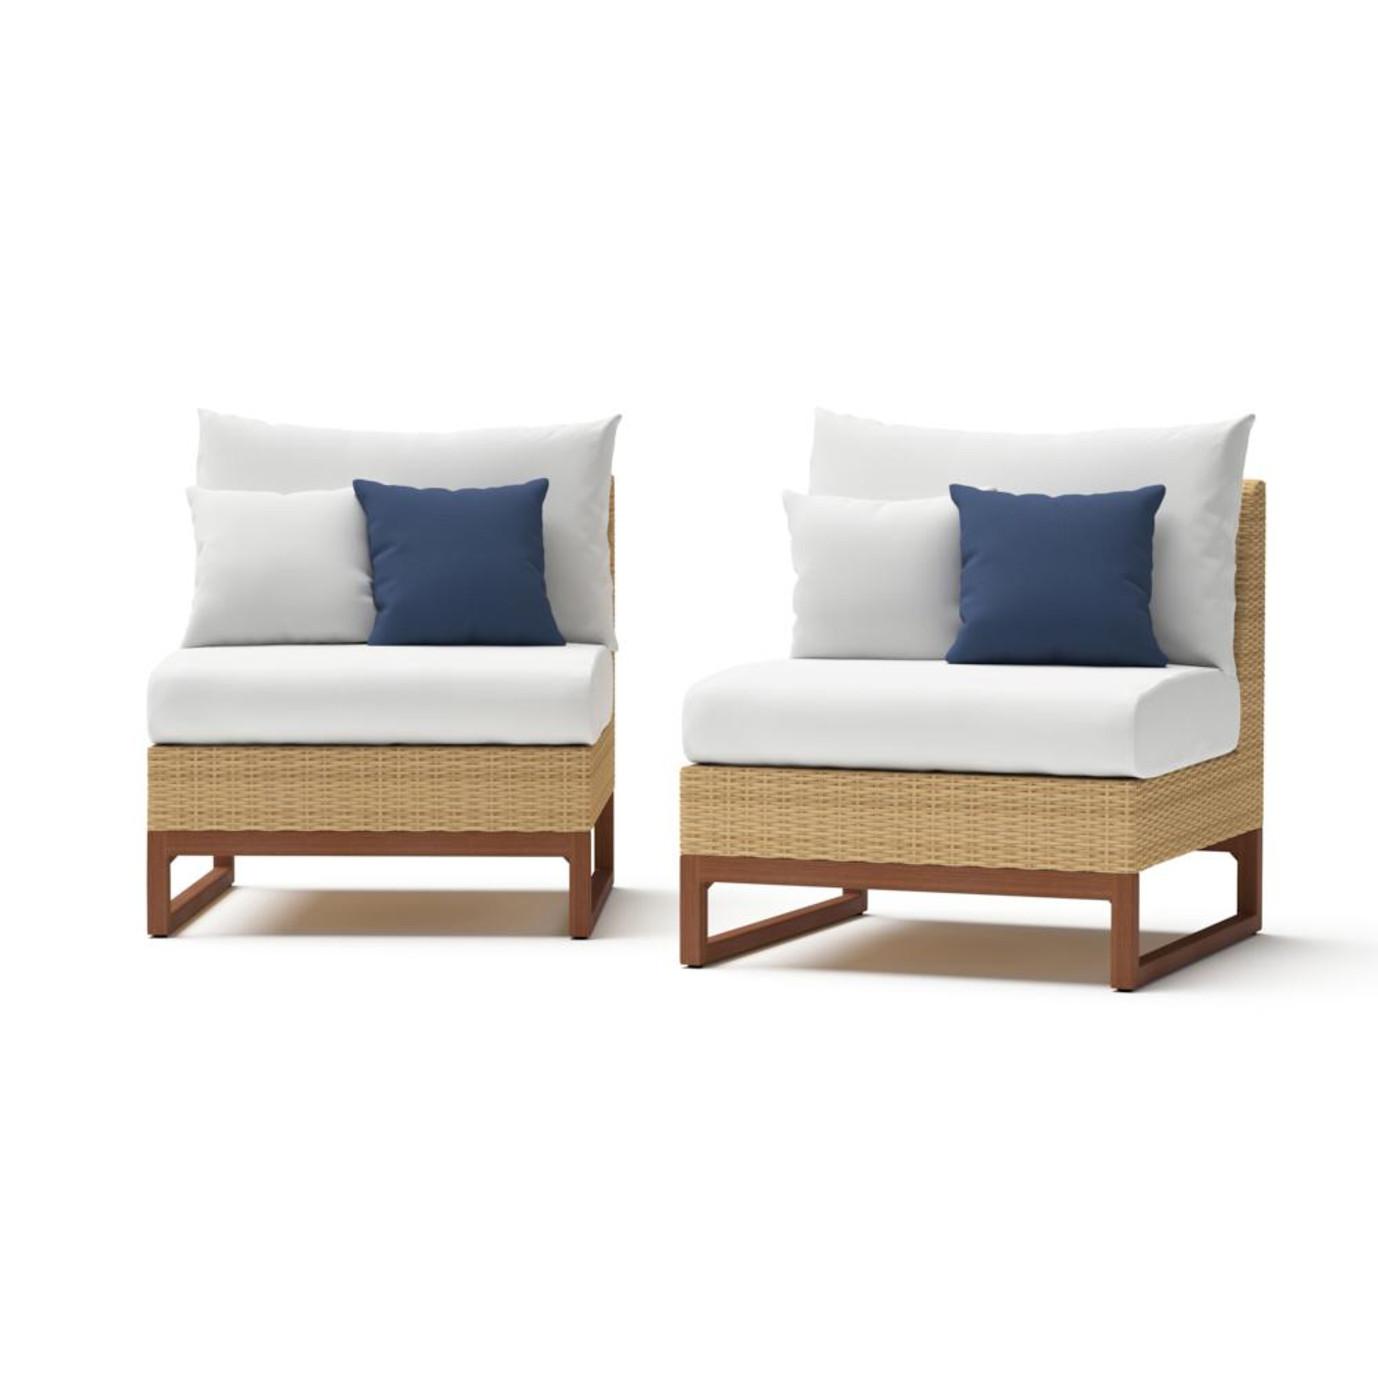 Mili™ Armless Chairs